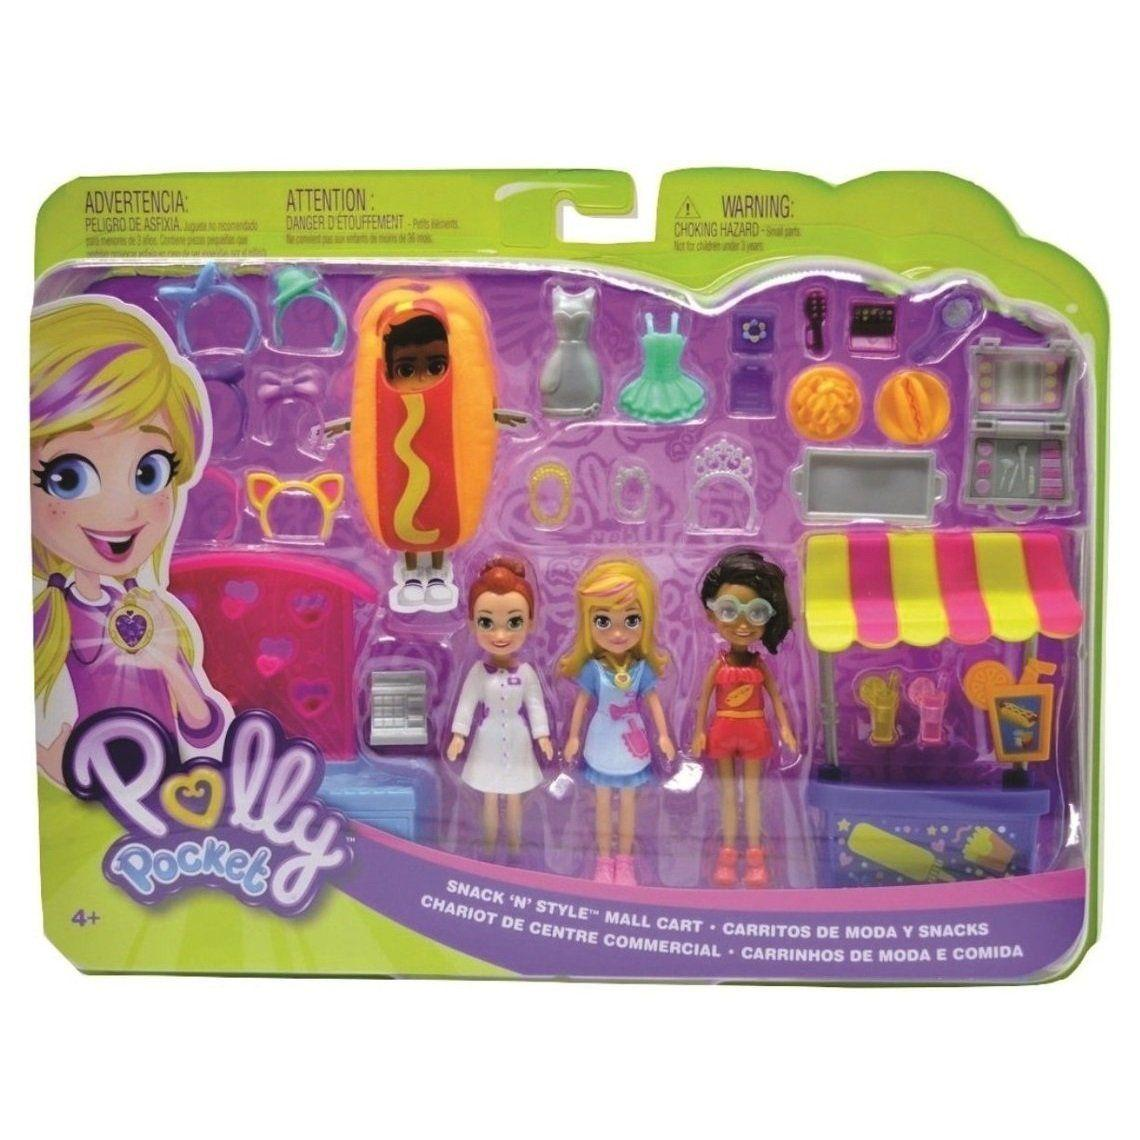 Polly Quiosque  Diversão  Shopping Mattel  GFR10  Cores Variadas